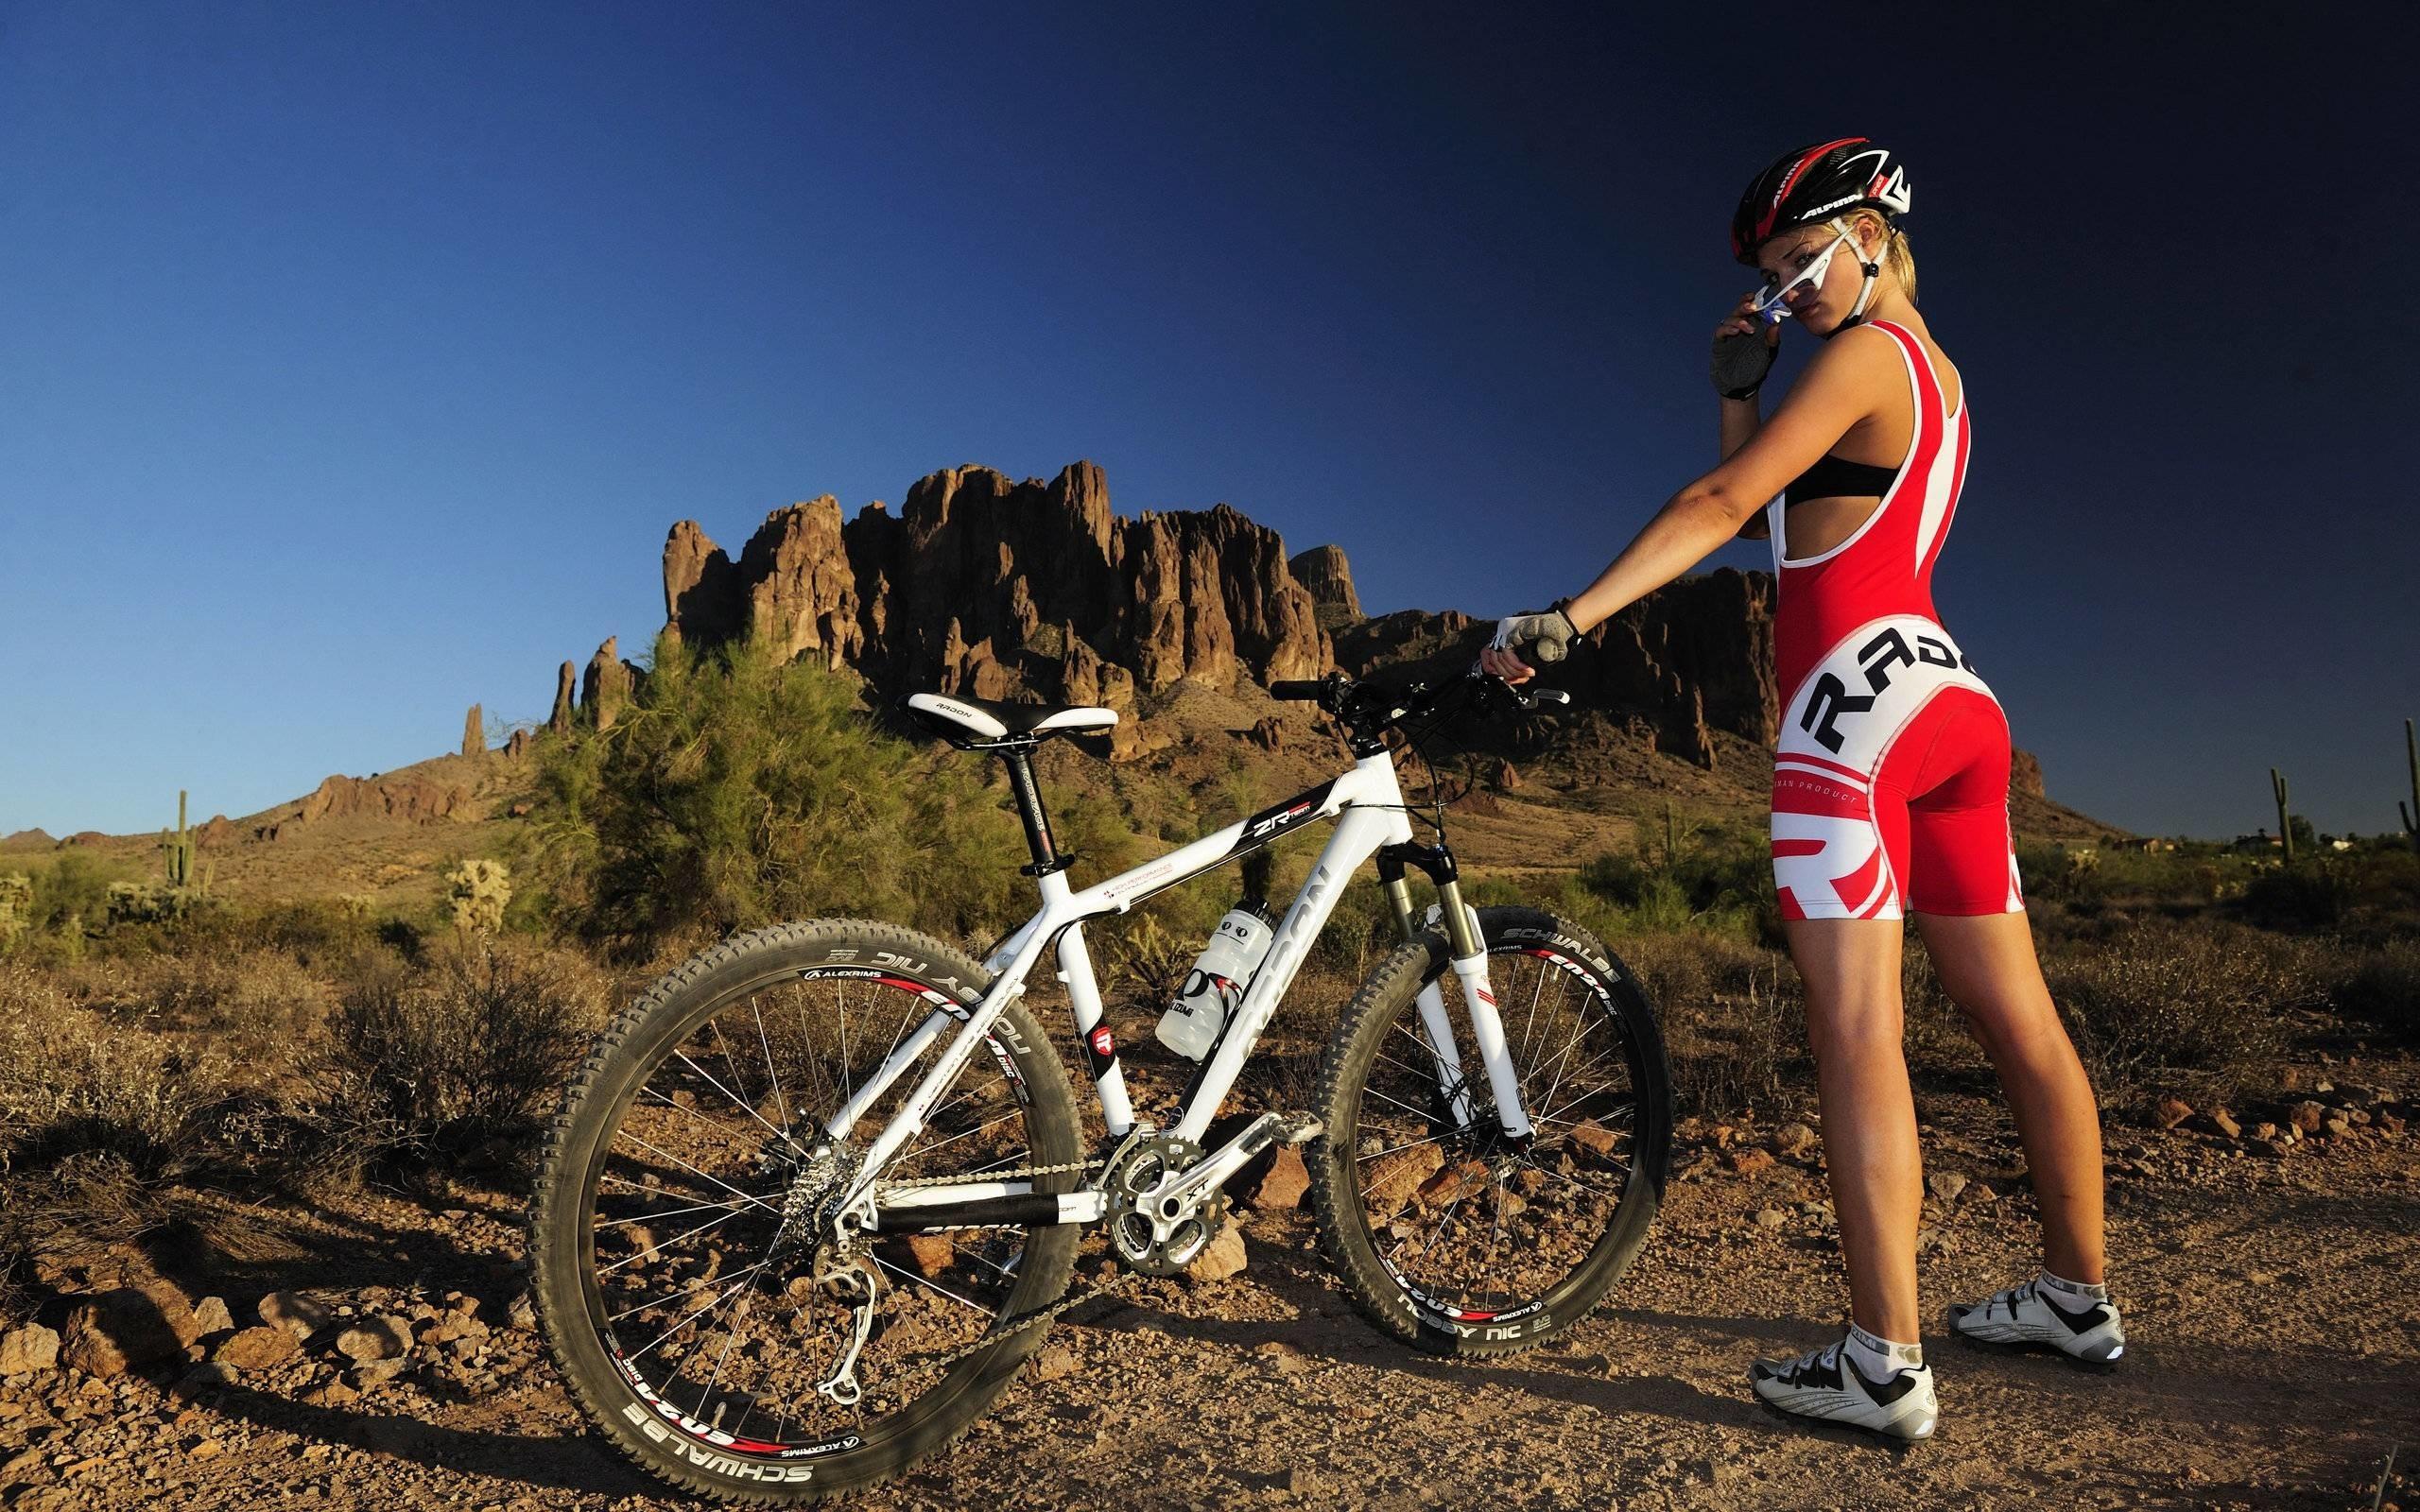 Res: 2560x1600, Mountain Bike Wallpapers - Full HD wallpaper search